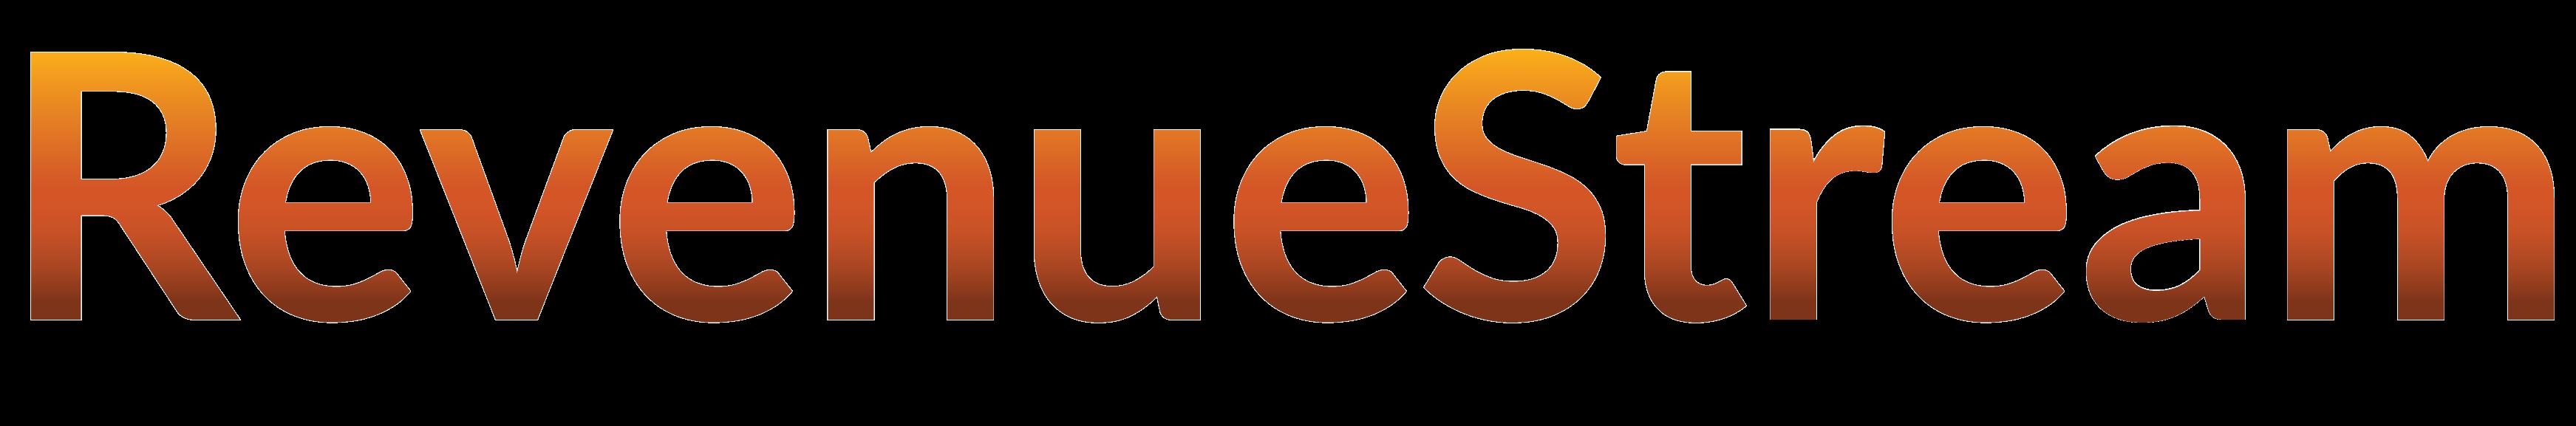 RevenueStream logo